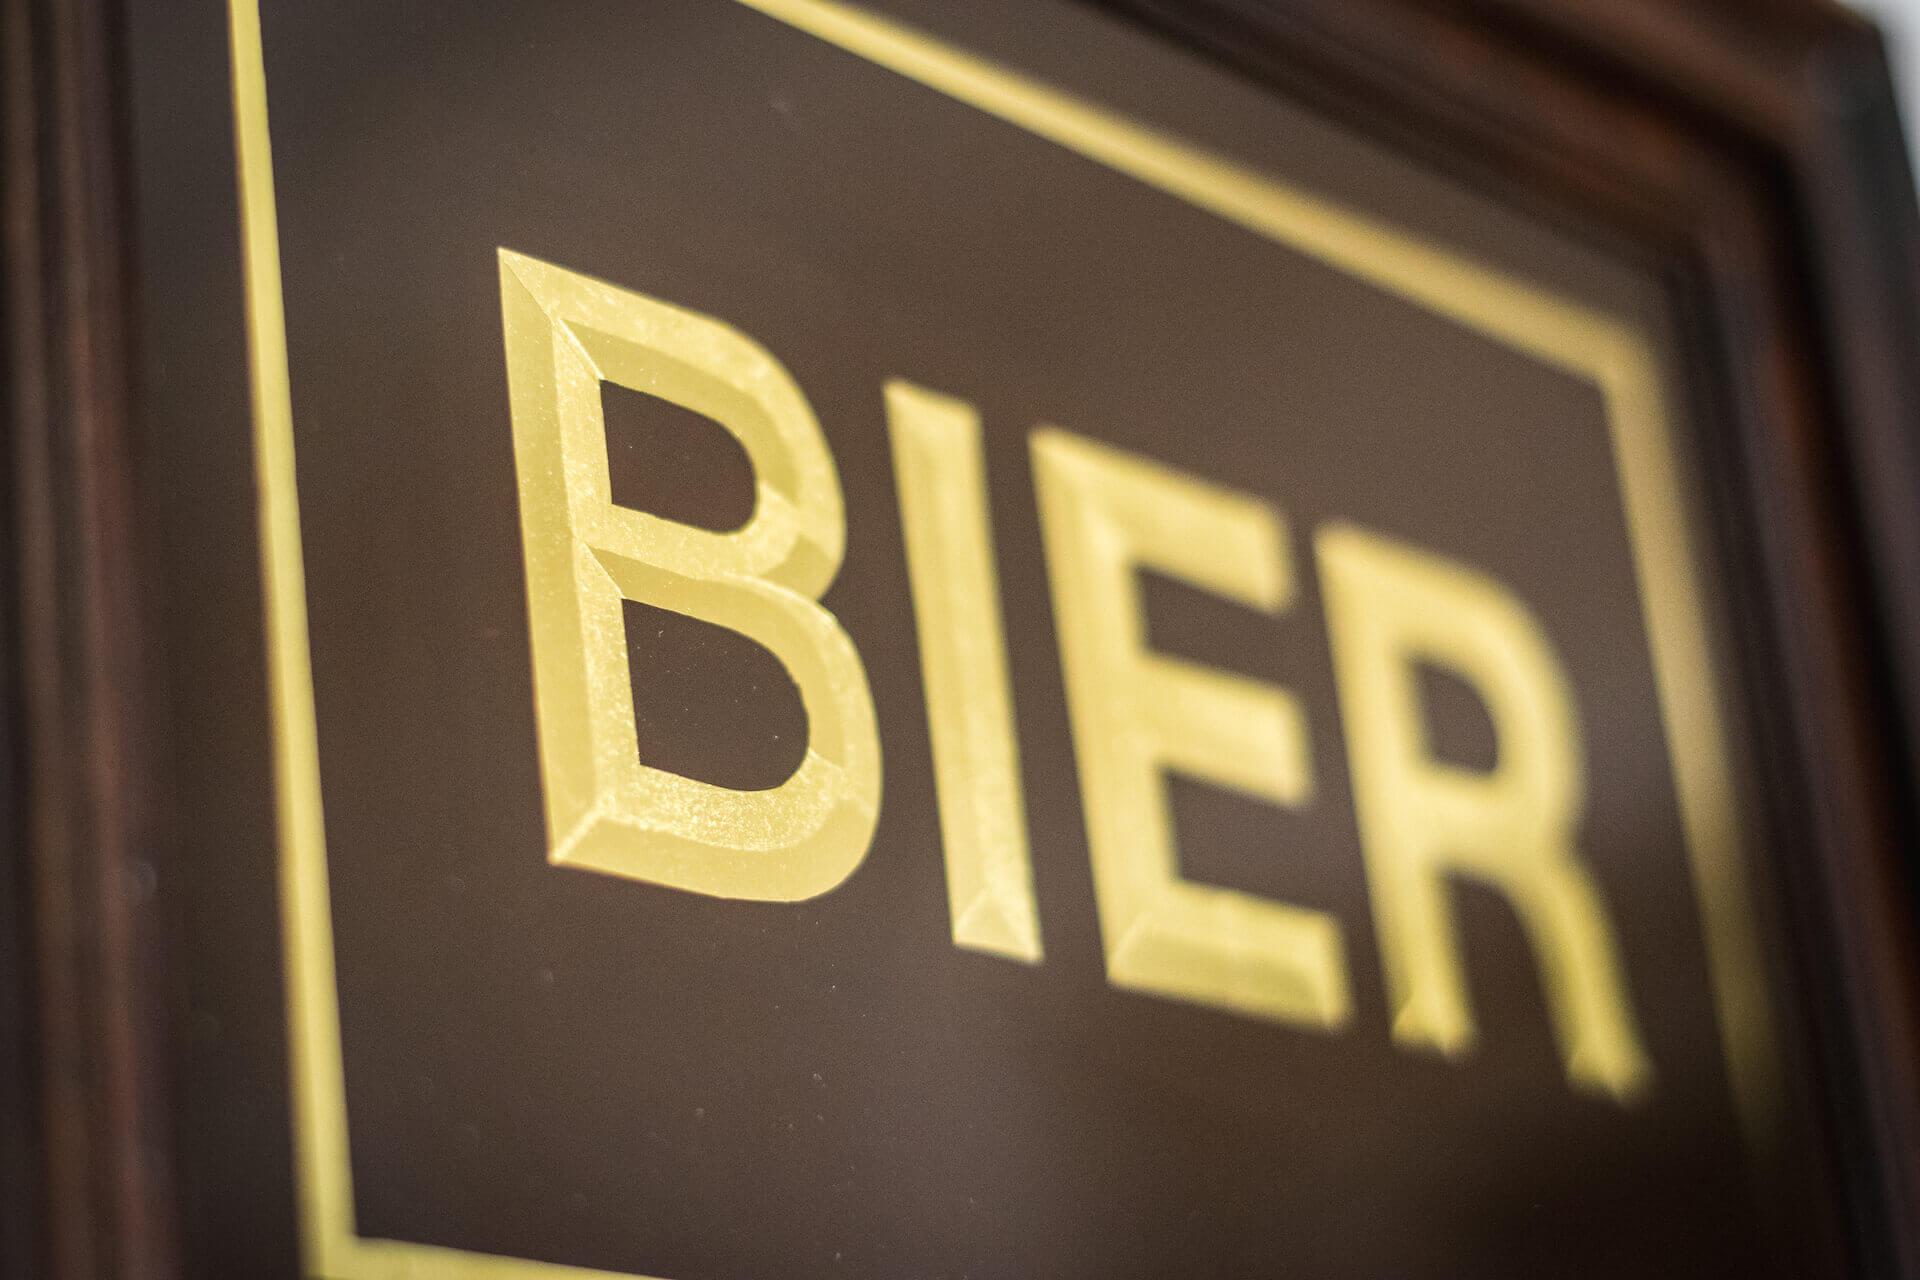 Letterschildering bier op bord